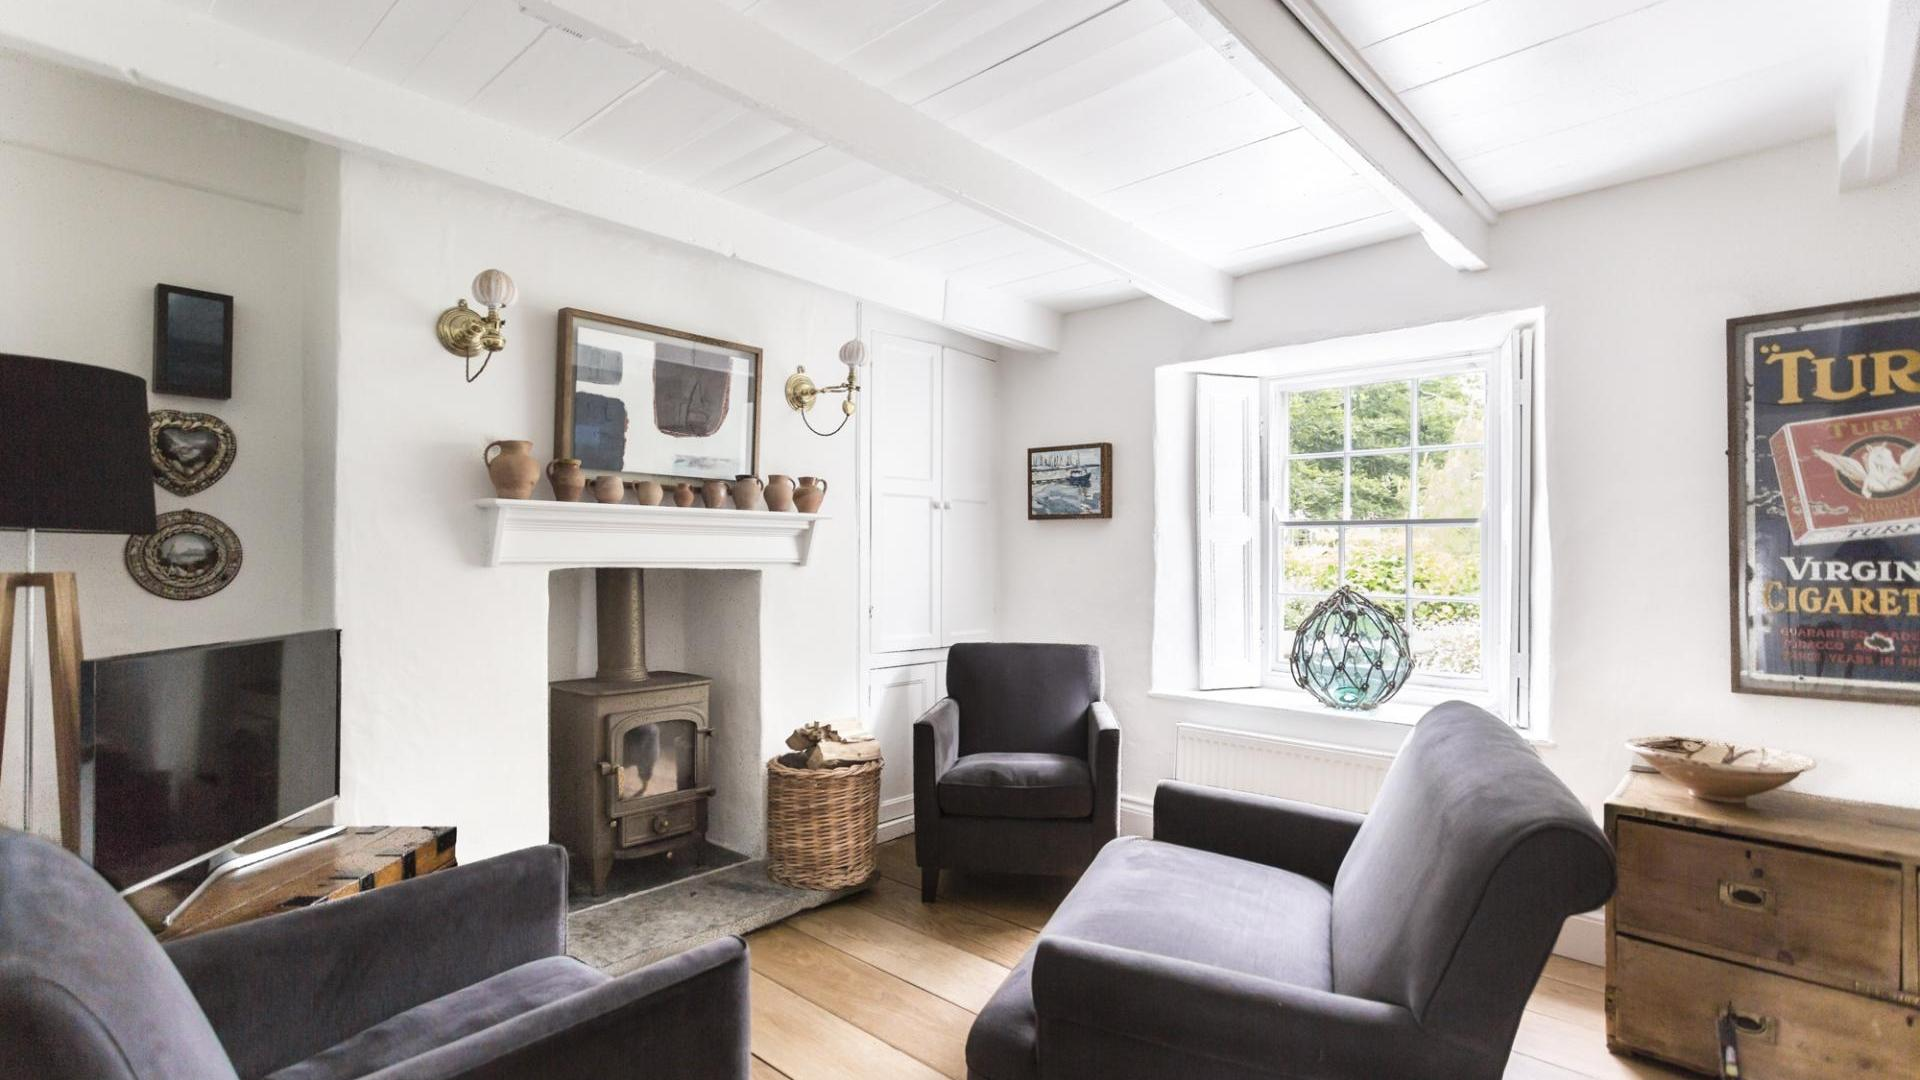 2 Bedroom Cottage in Cornwall, United Kingdom